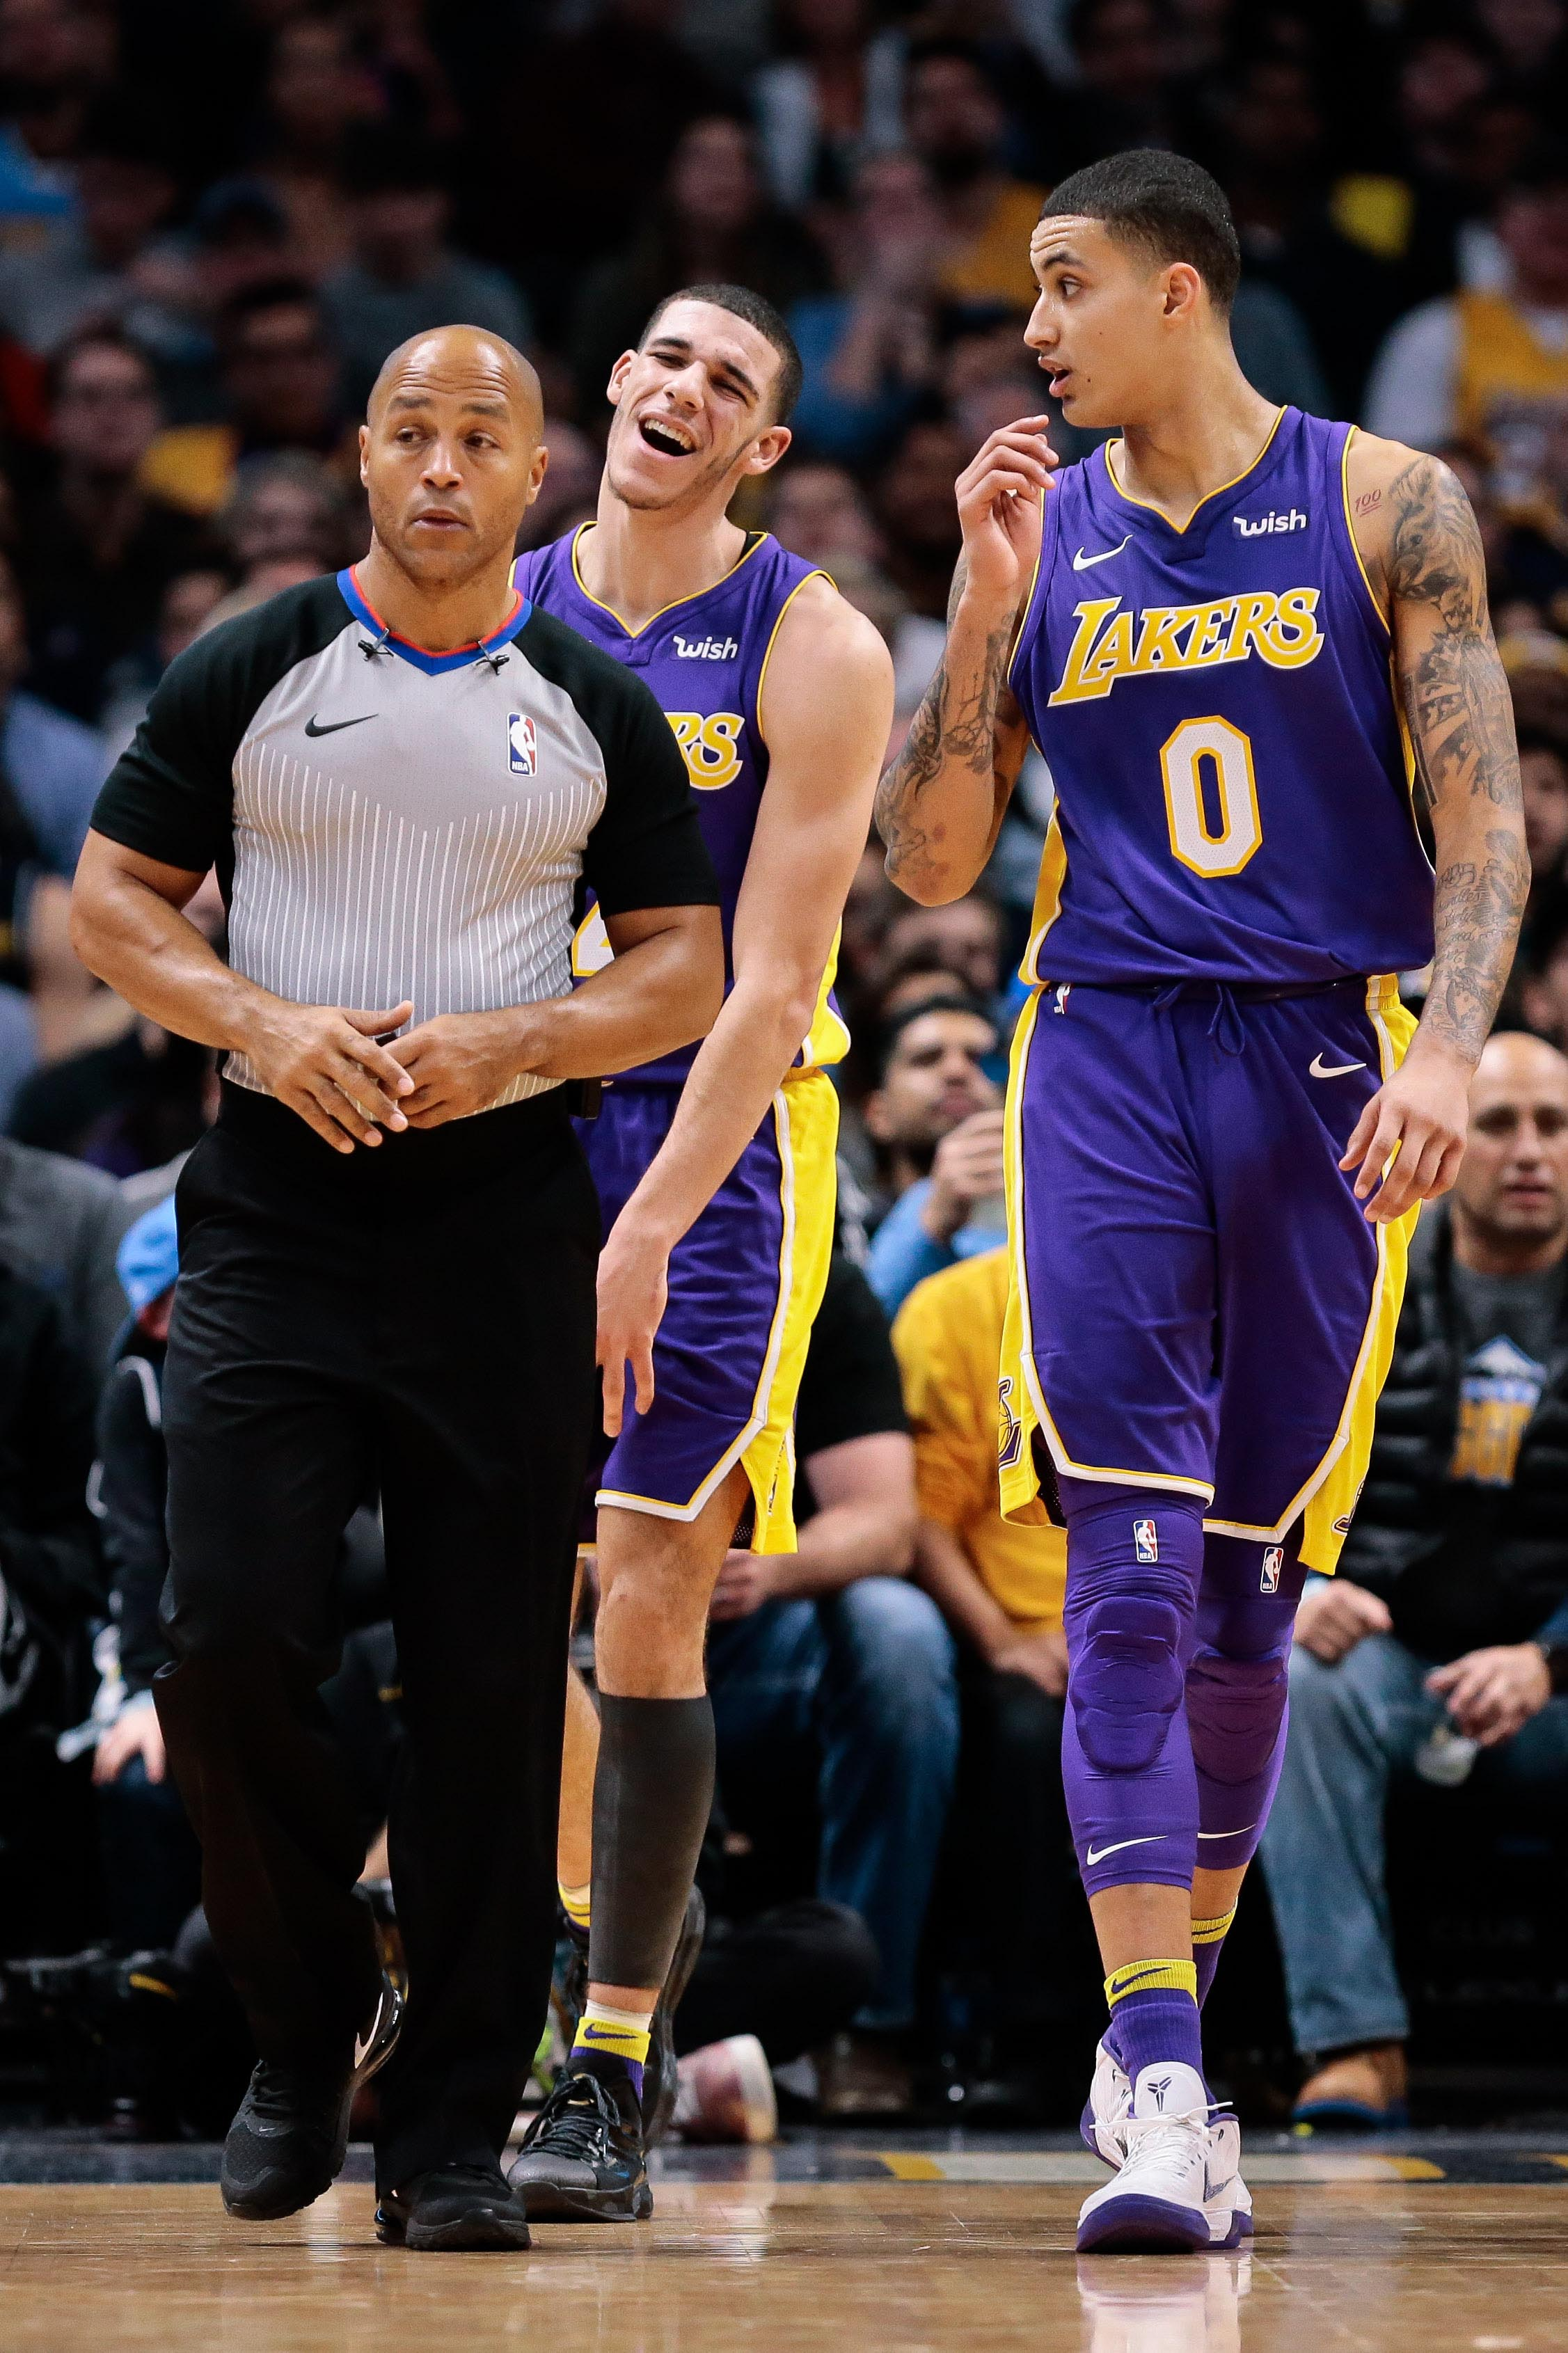 Nba Basketball Los Angeles Lakers: Kyle Kuzma: People Are 'underestimating' Lakers